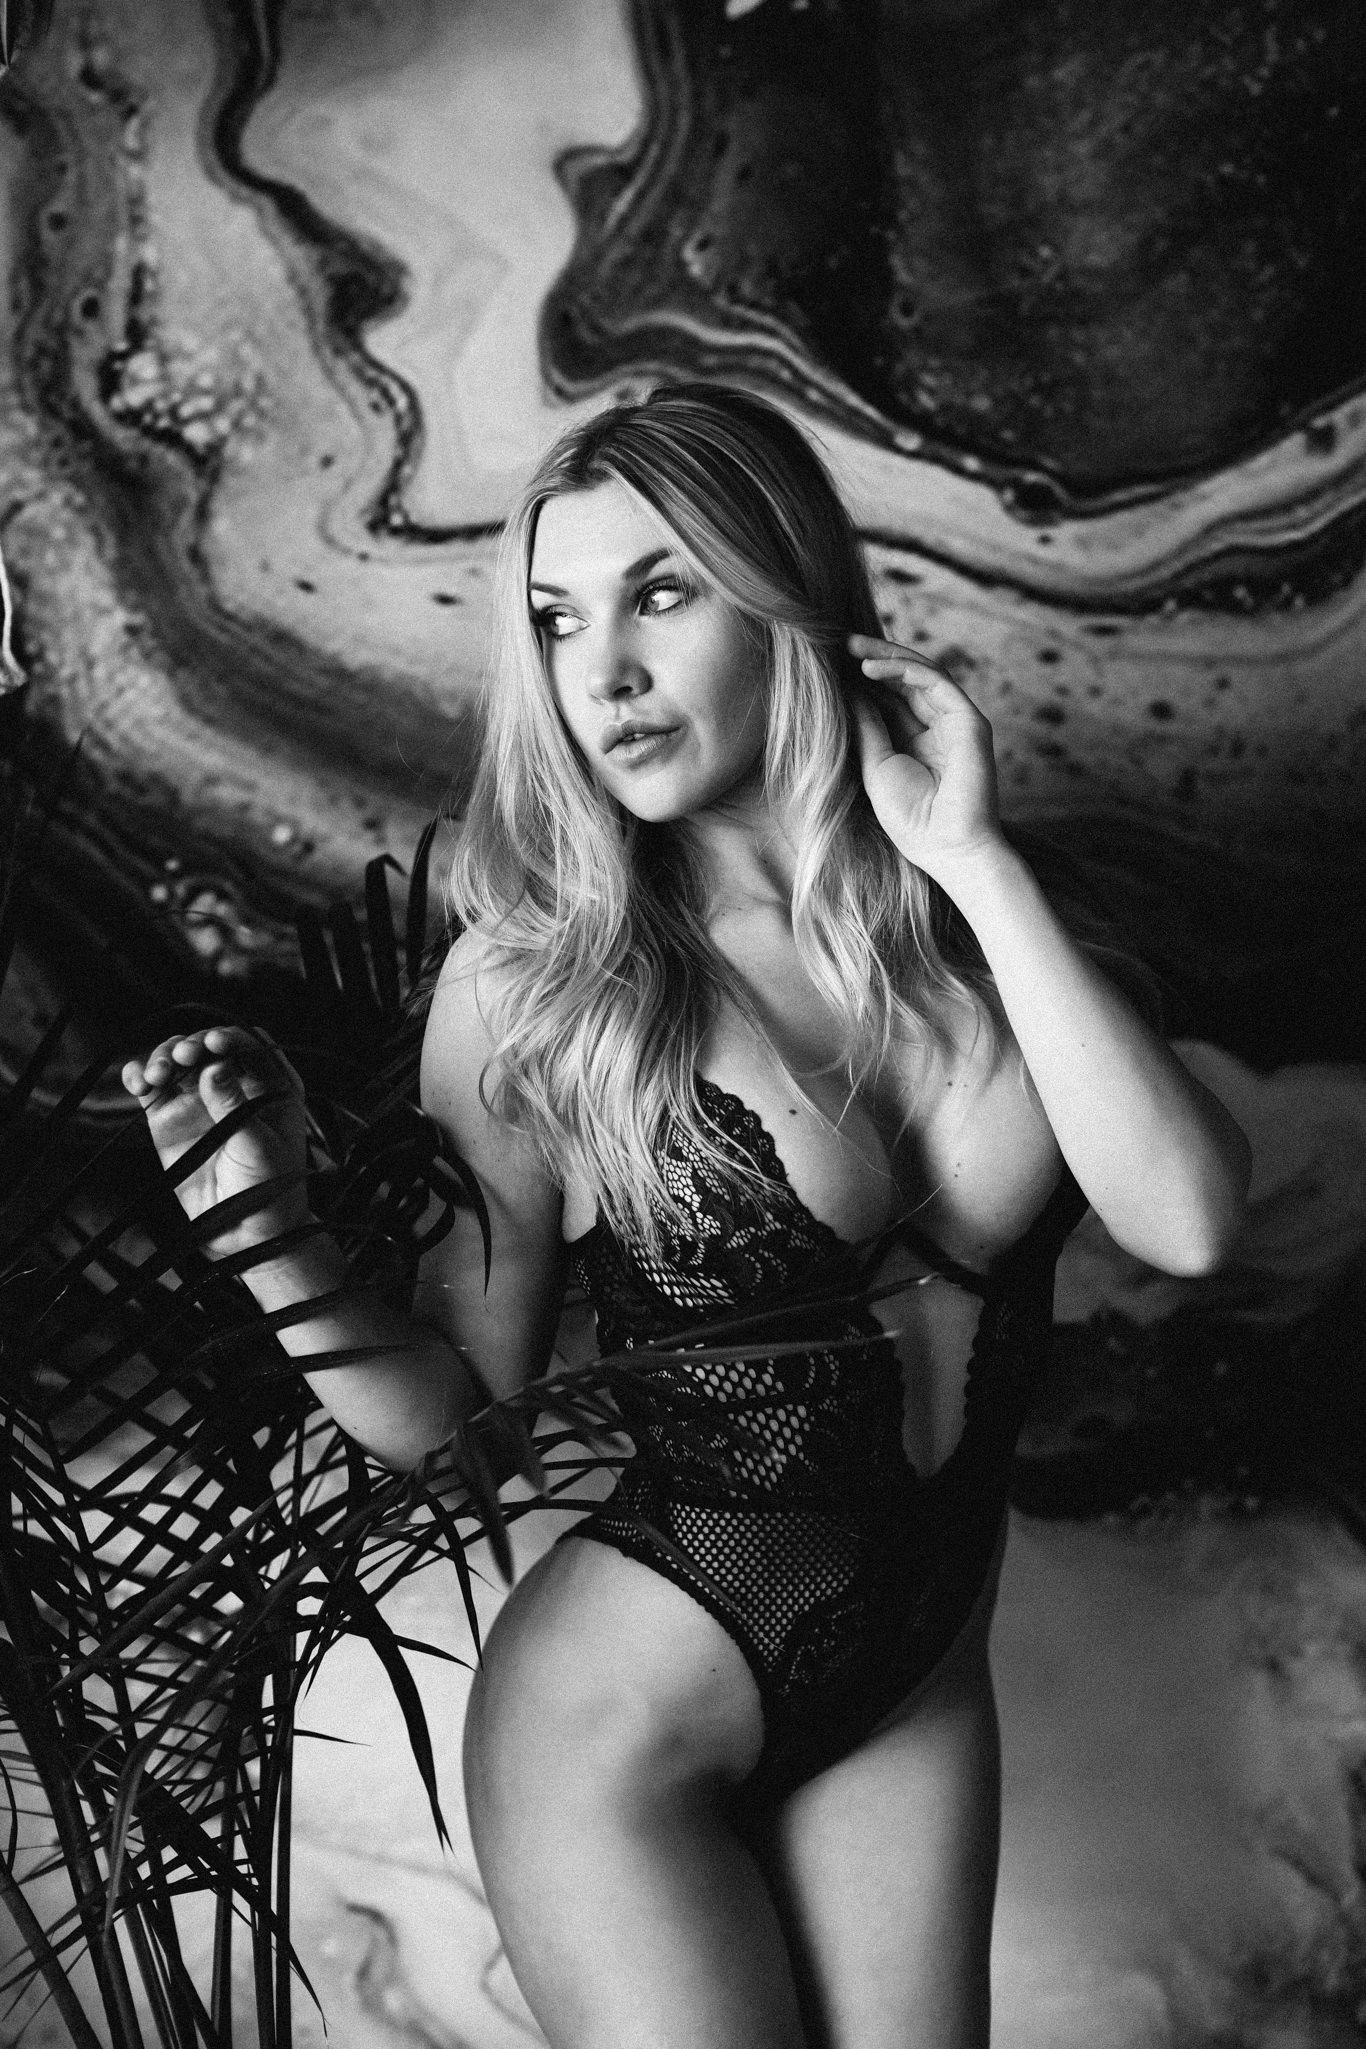 calgary-boudoir-photoshoot-winner-10